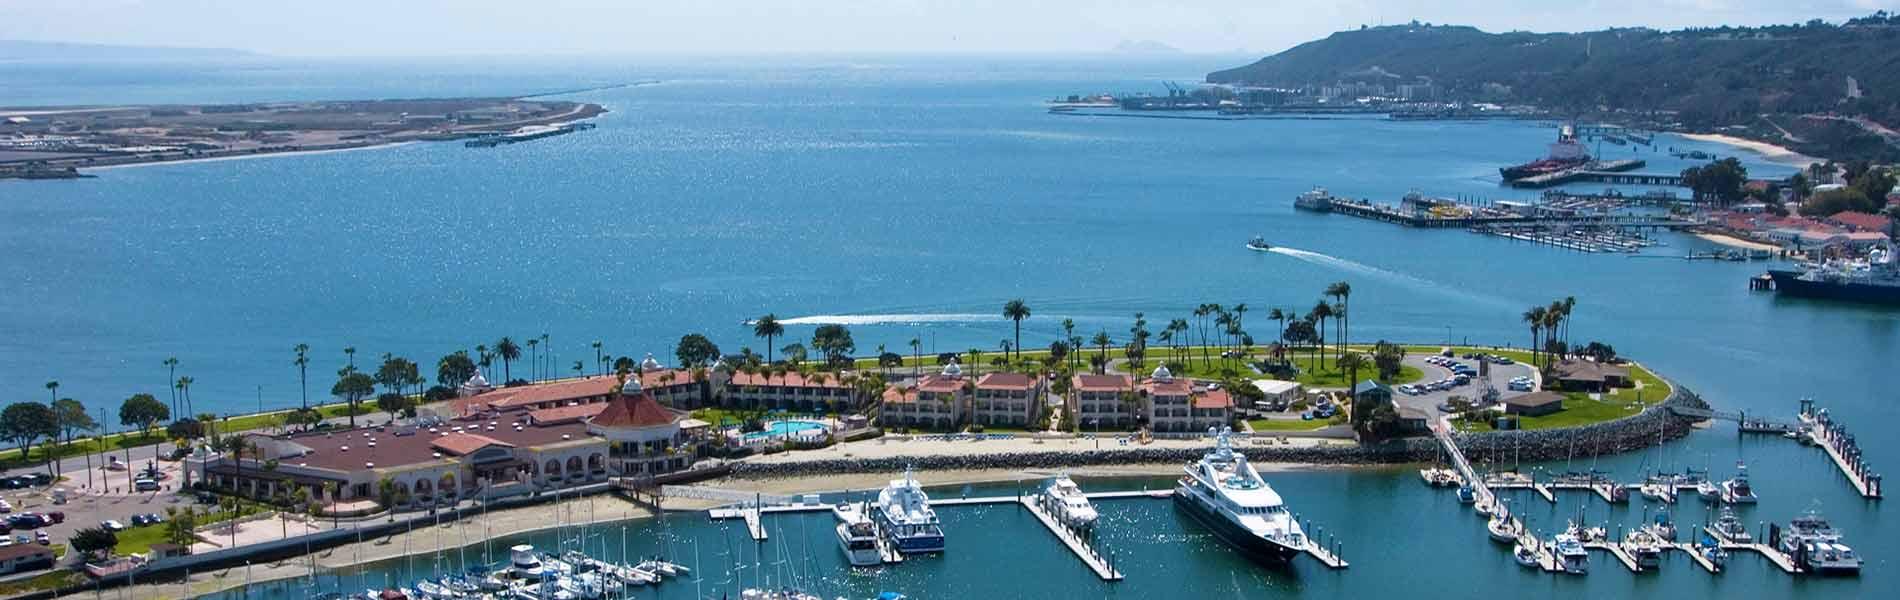 Kona Kai Marina San Diego Shelter Island